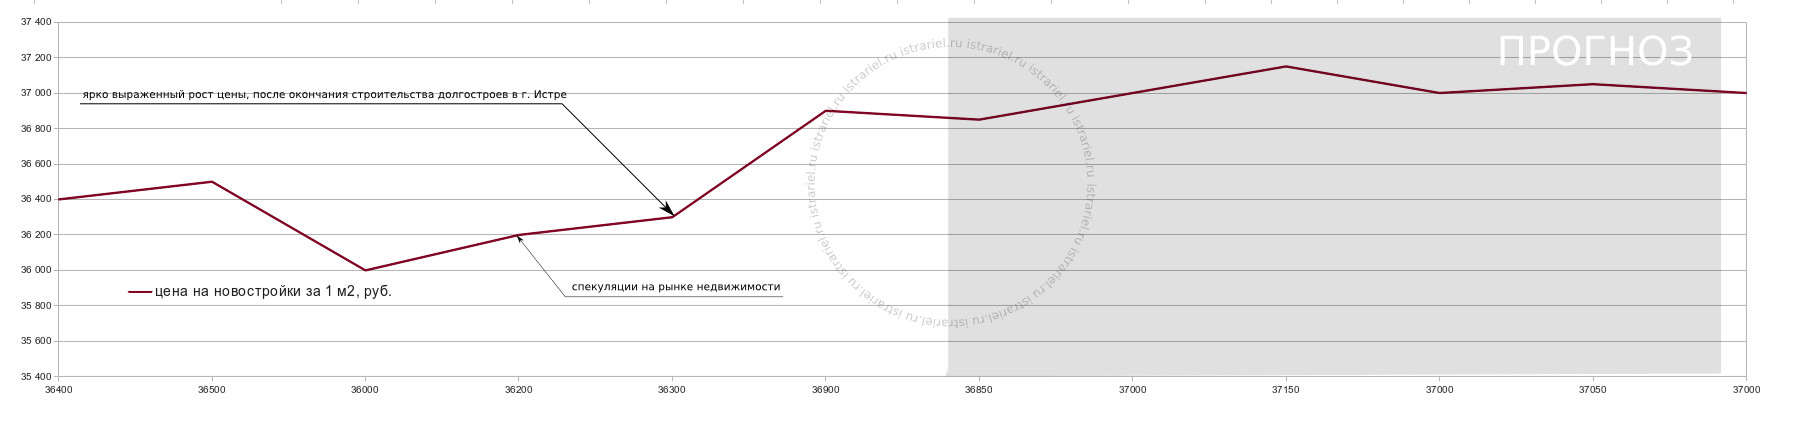 график спекуляций цен на недвижимости